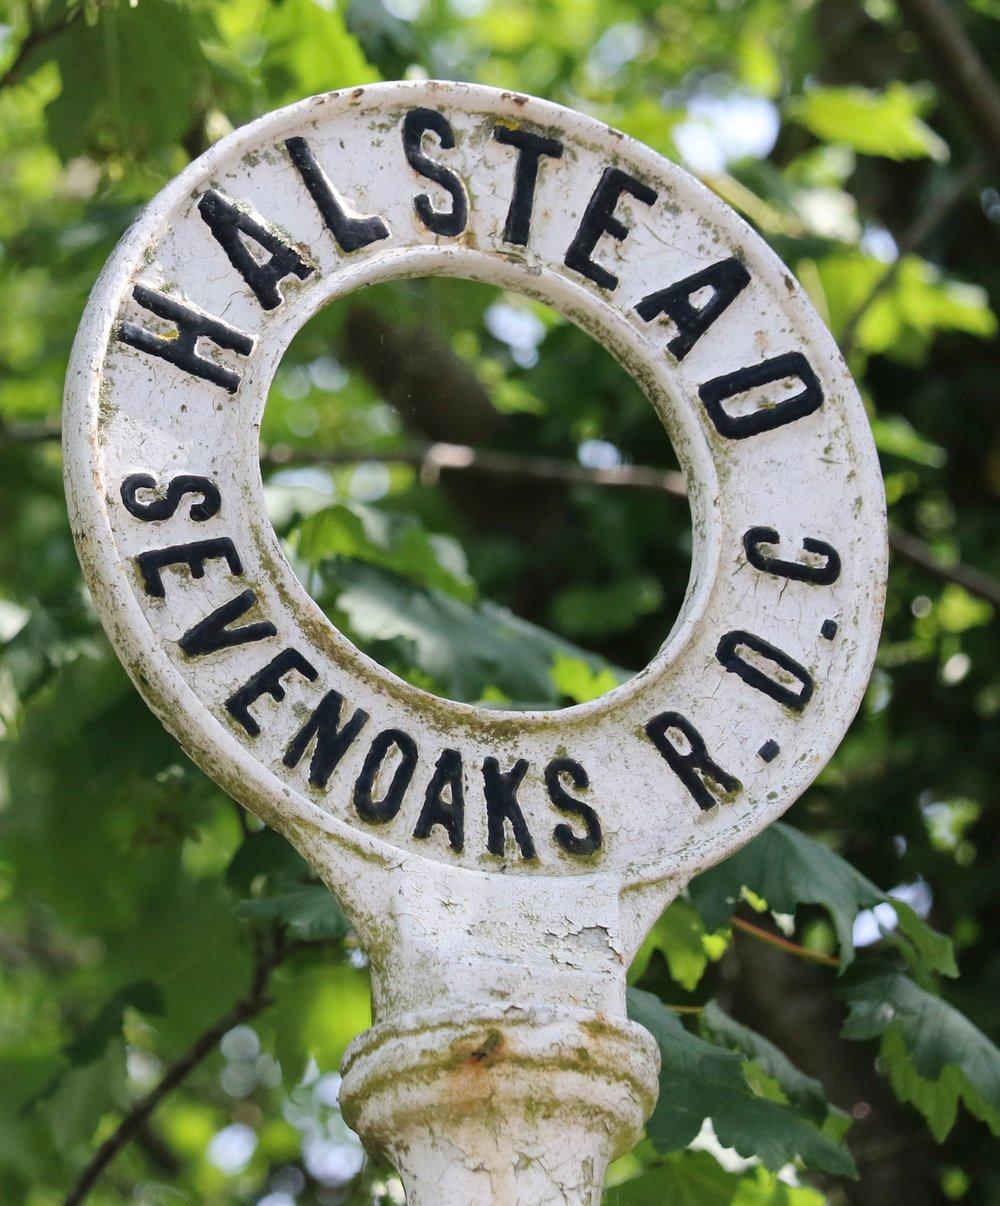 halstead-sign (2).JPG